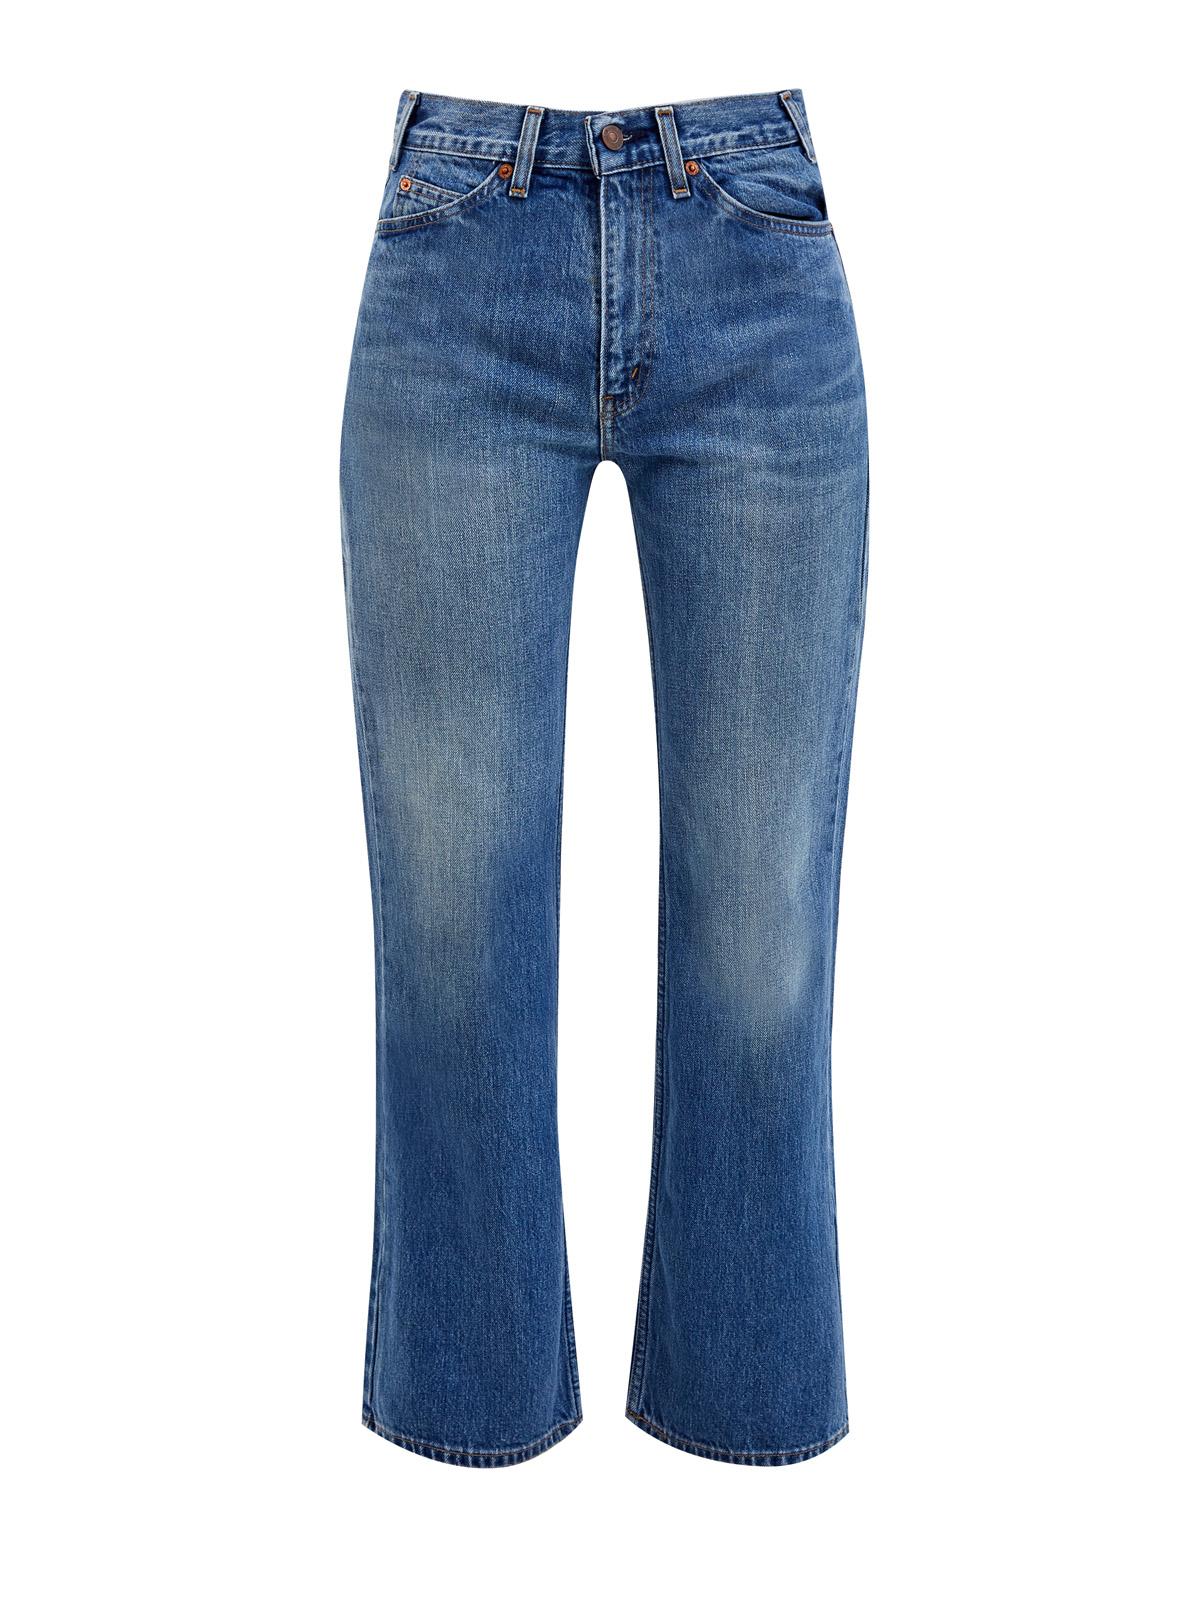 Джинсы Levi's® X Valentino из плотного денима